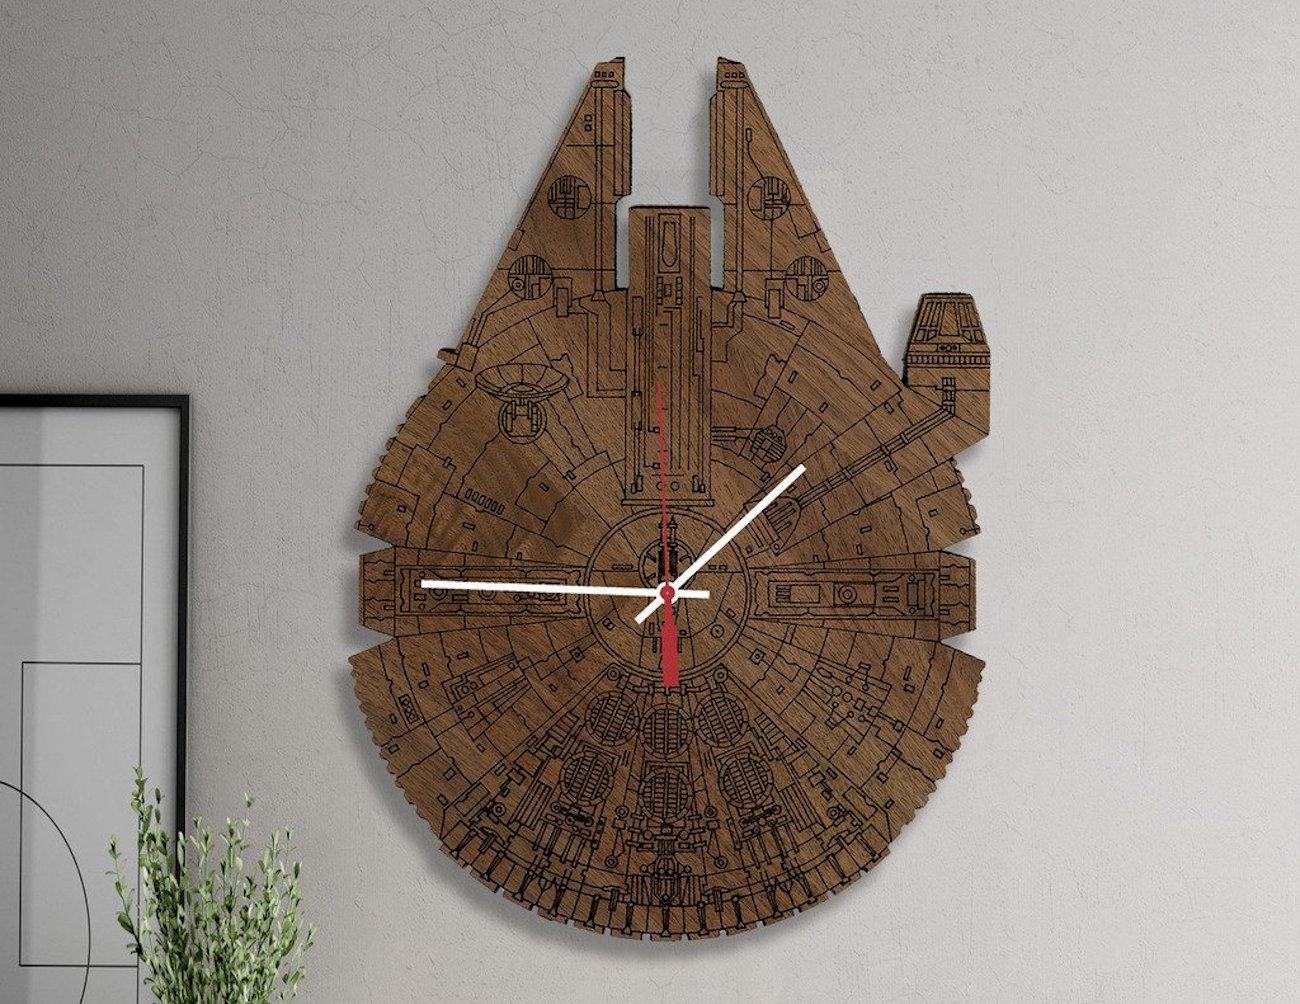 star wars millennium falcon wood wall clock review. Black Bedroom Furniture Sets. Home Design Ideas